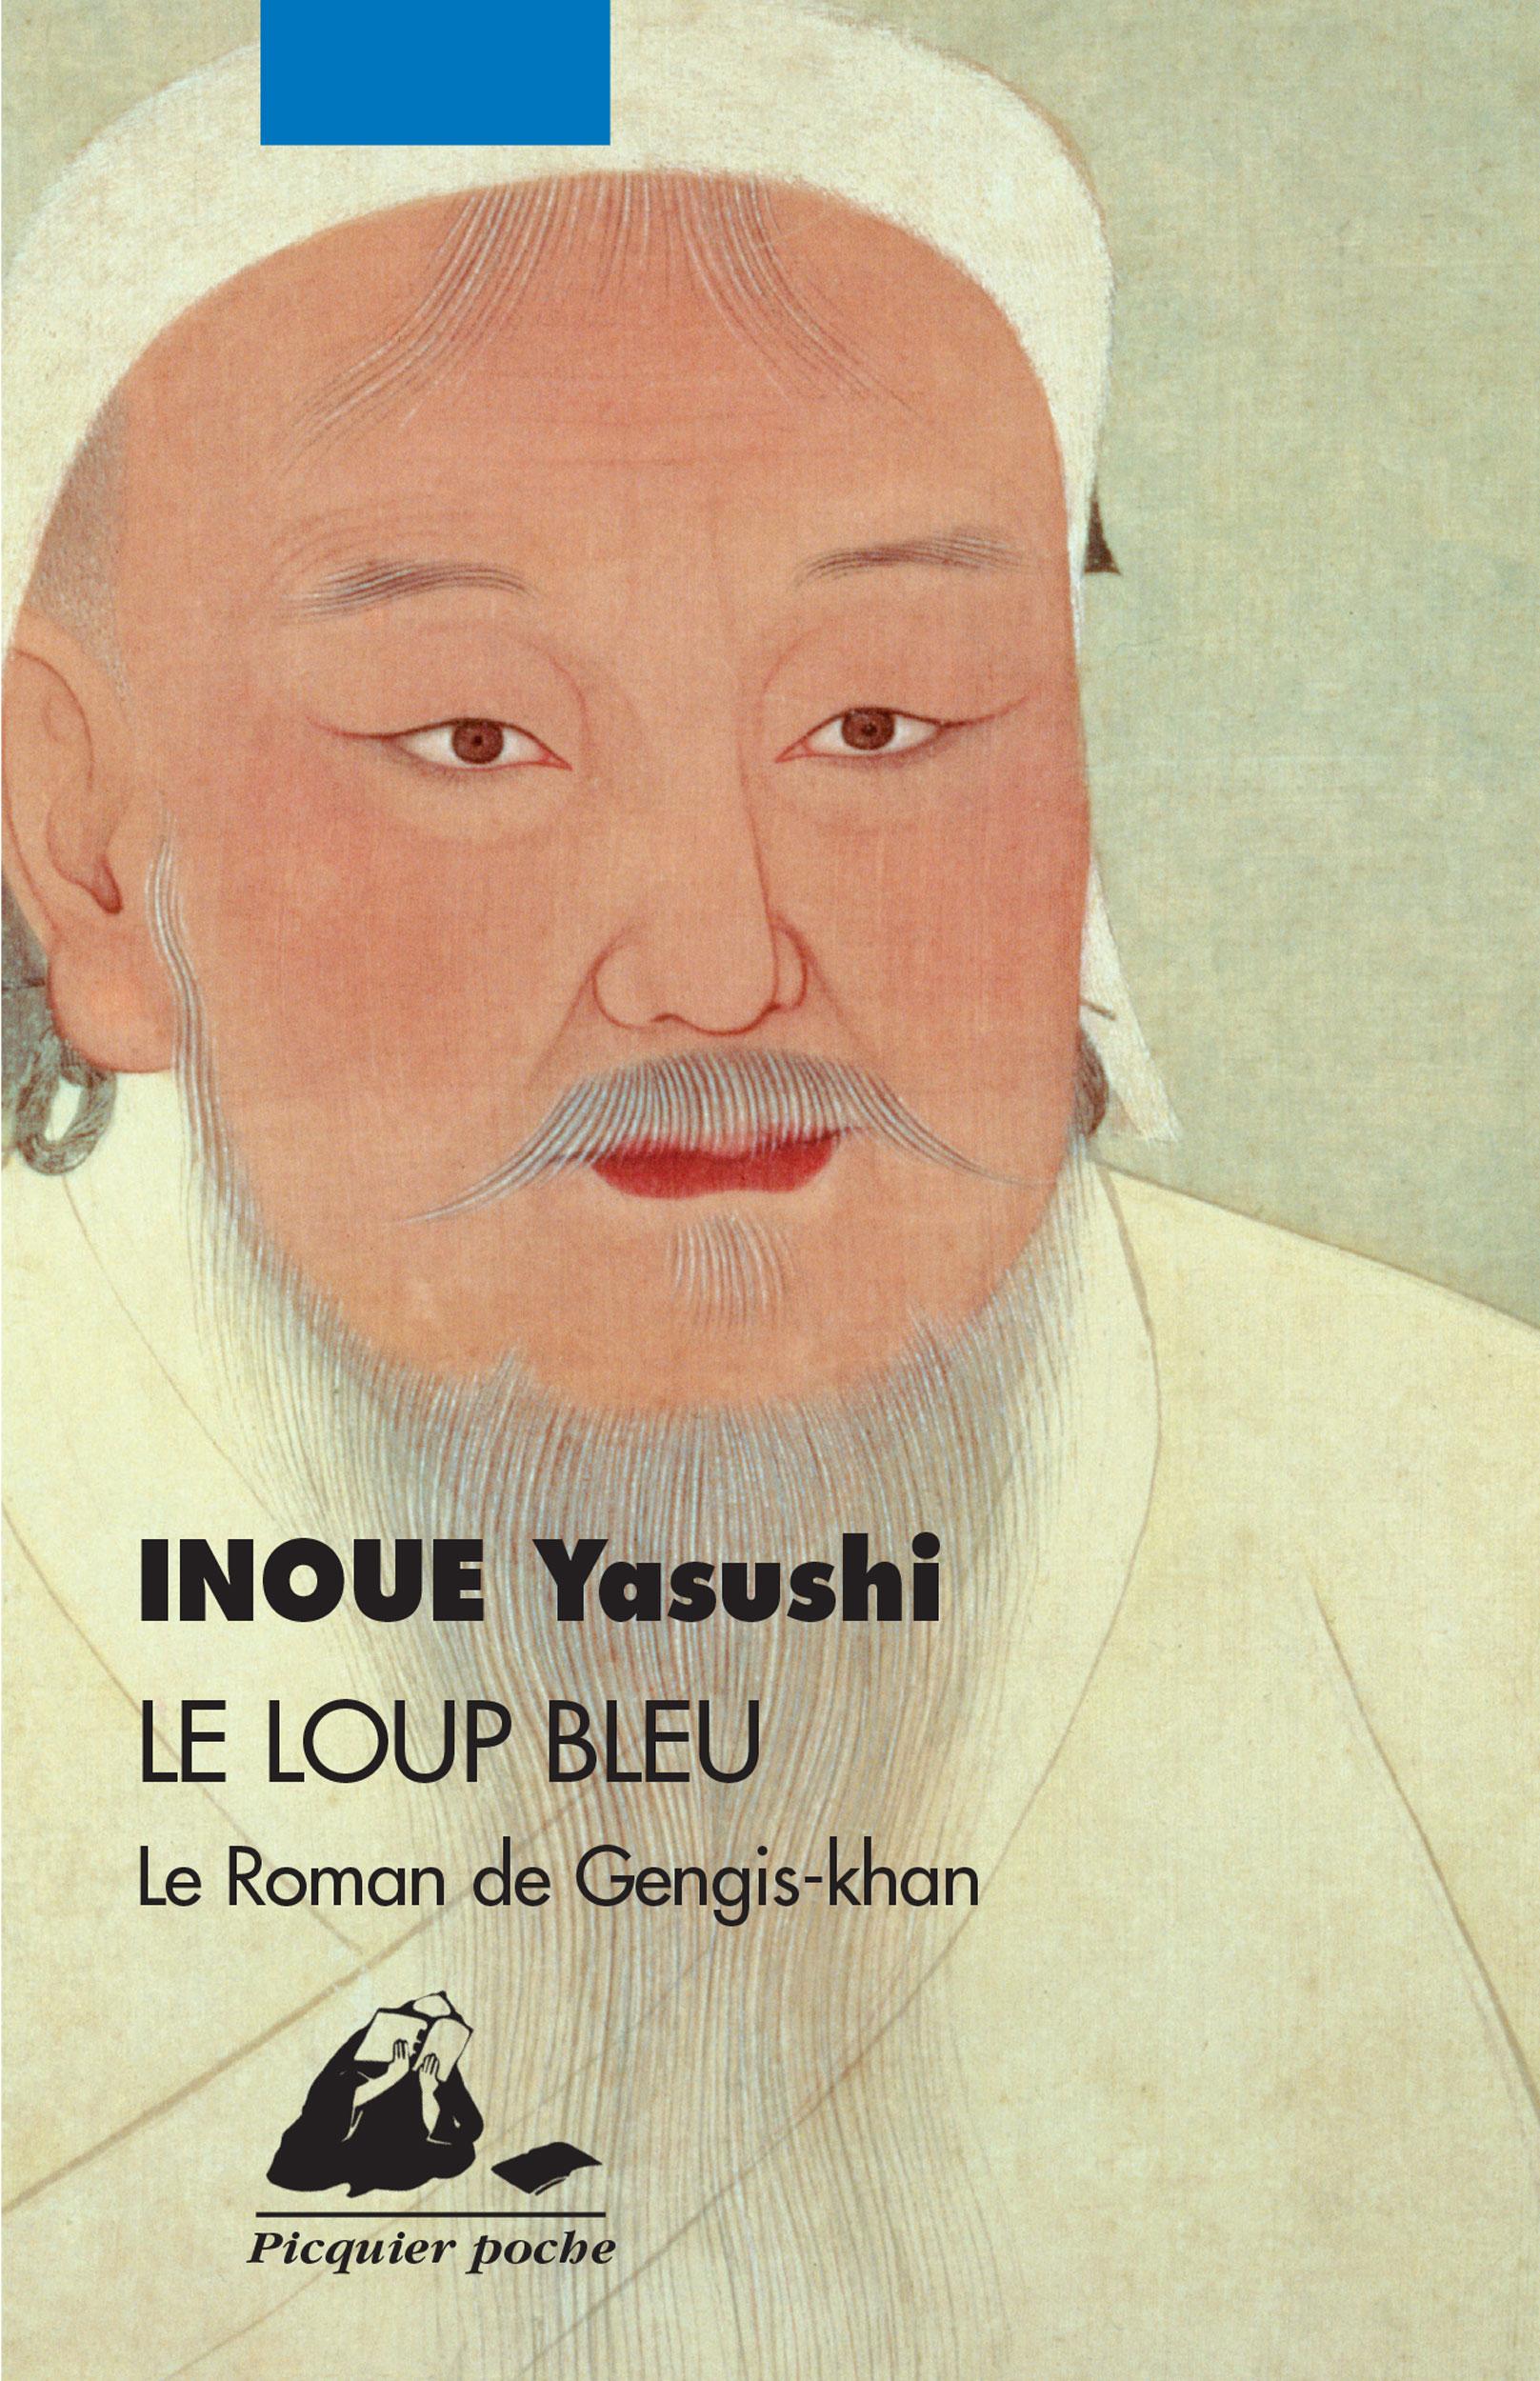 Le Loup bleu | INOUE, Yasushi